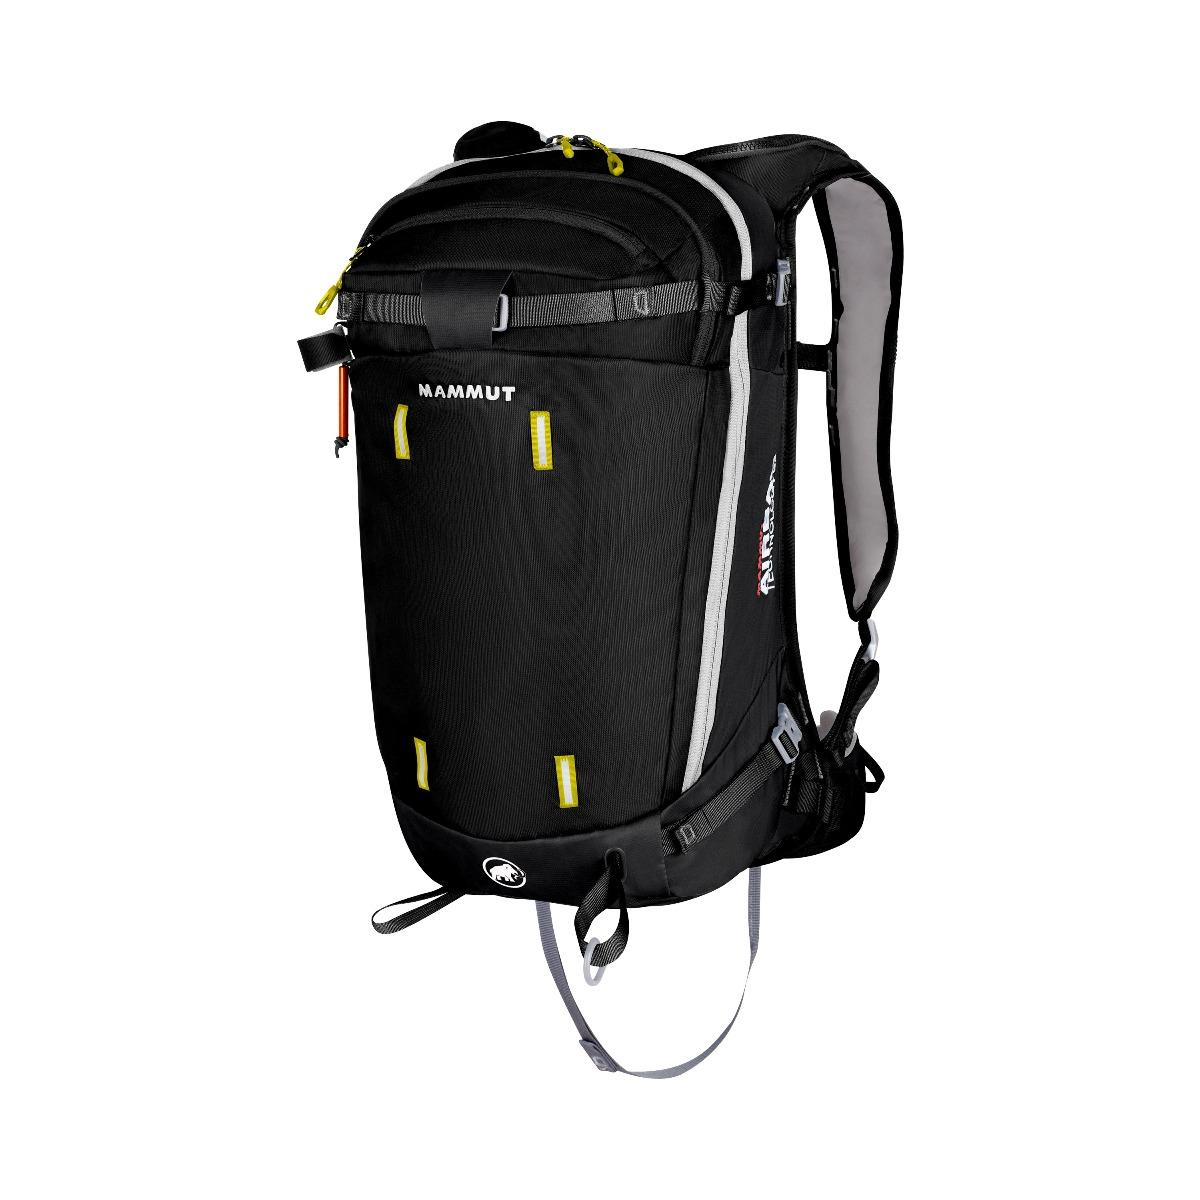 MAMMUT Light Protection Airbag 3.0 re 00150 phantom 30